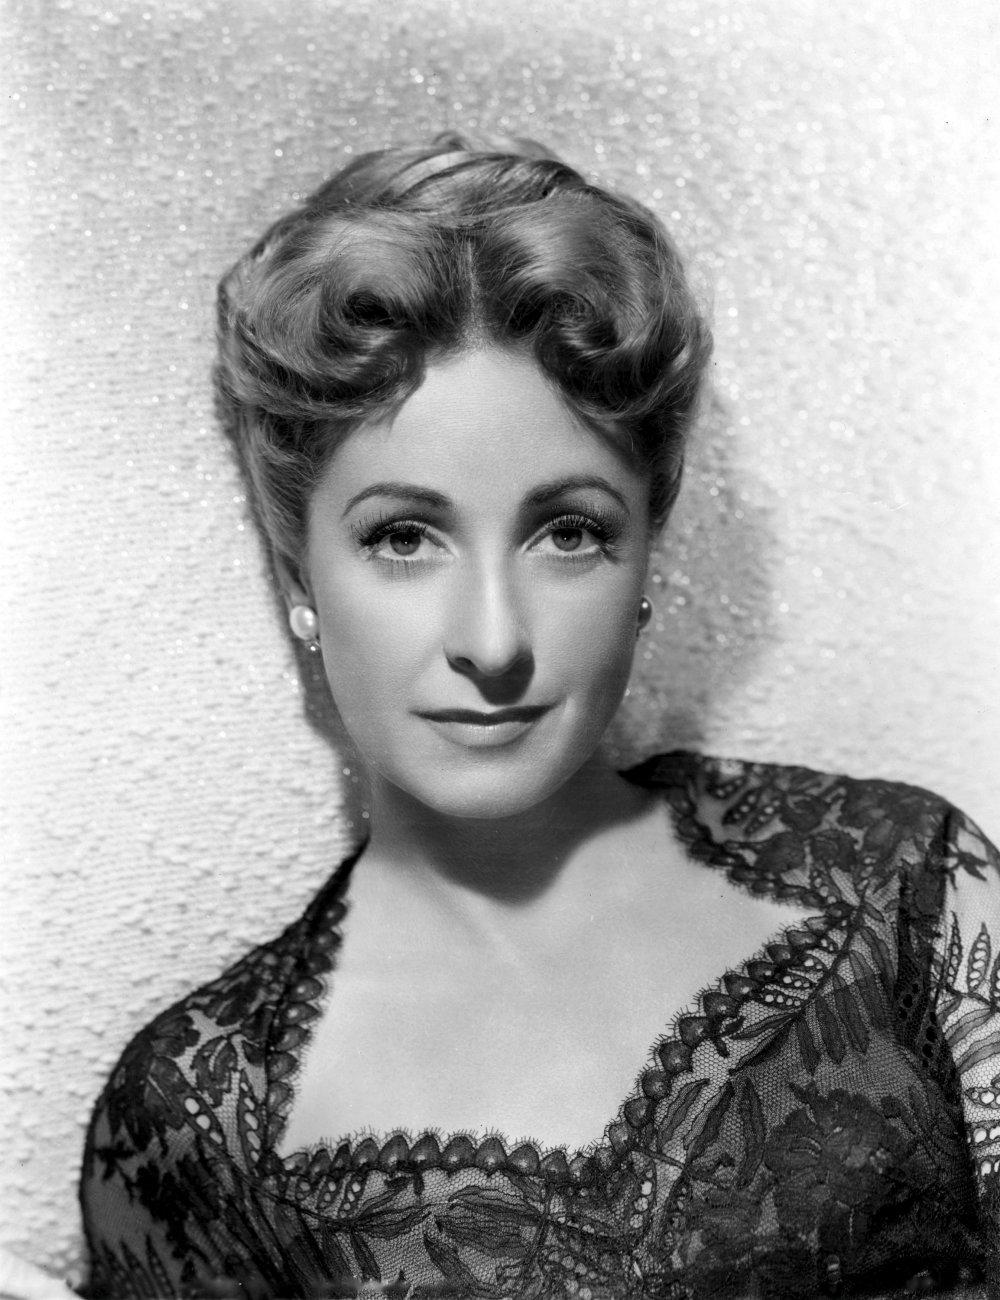 Danielle Darieux in Mac Ophuls' La Ronde (1950)